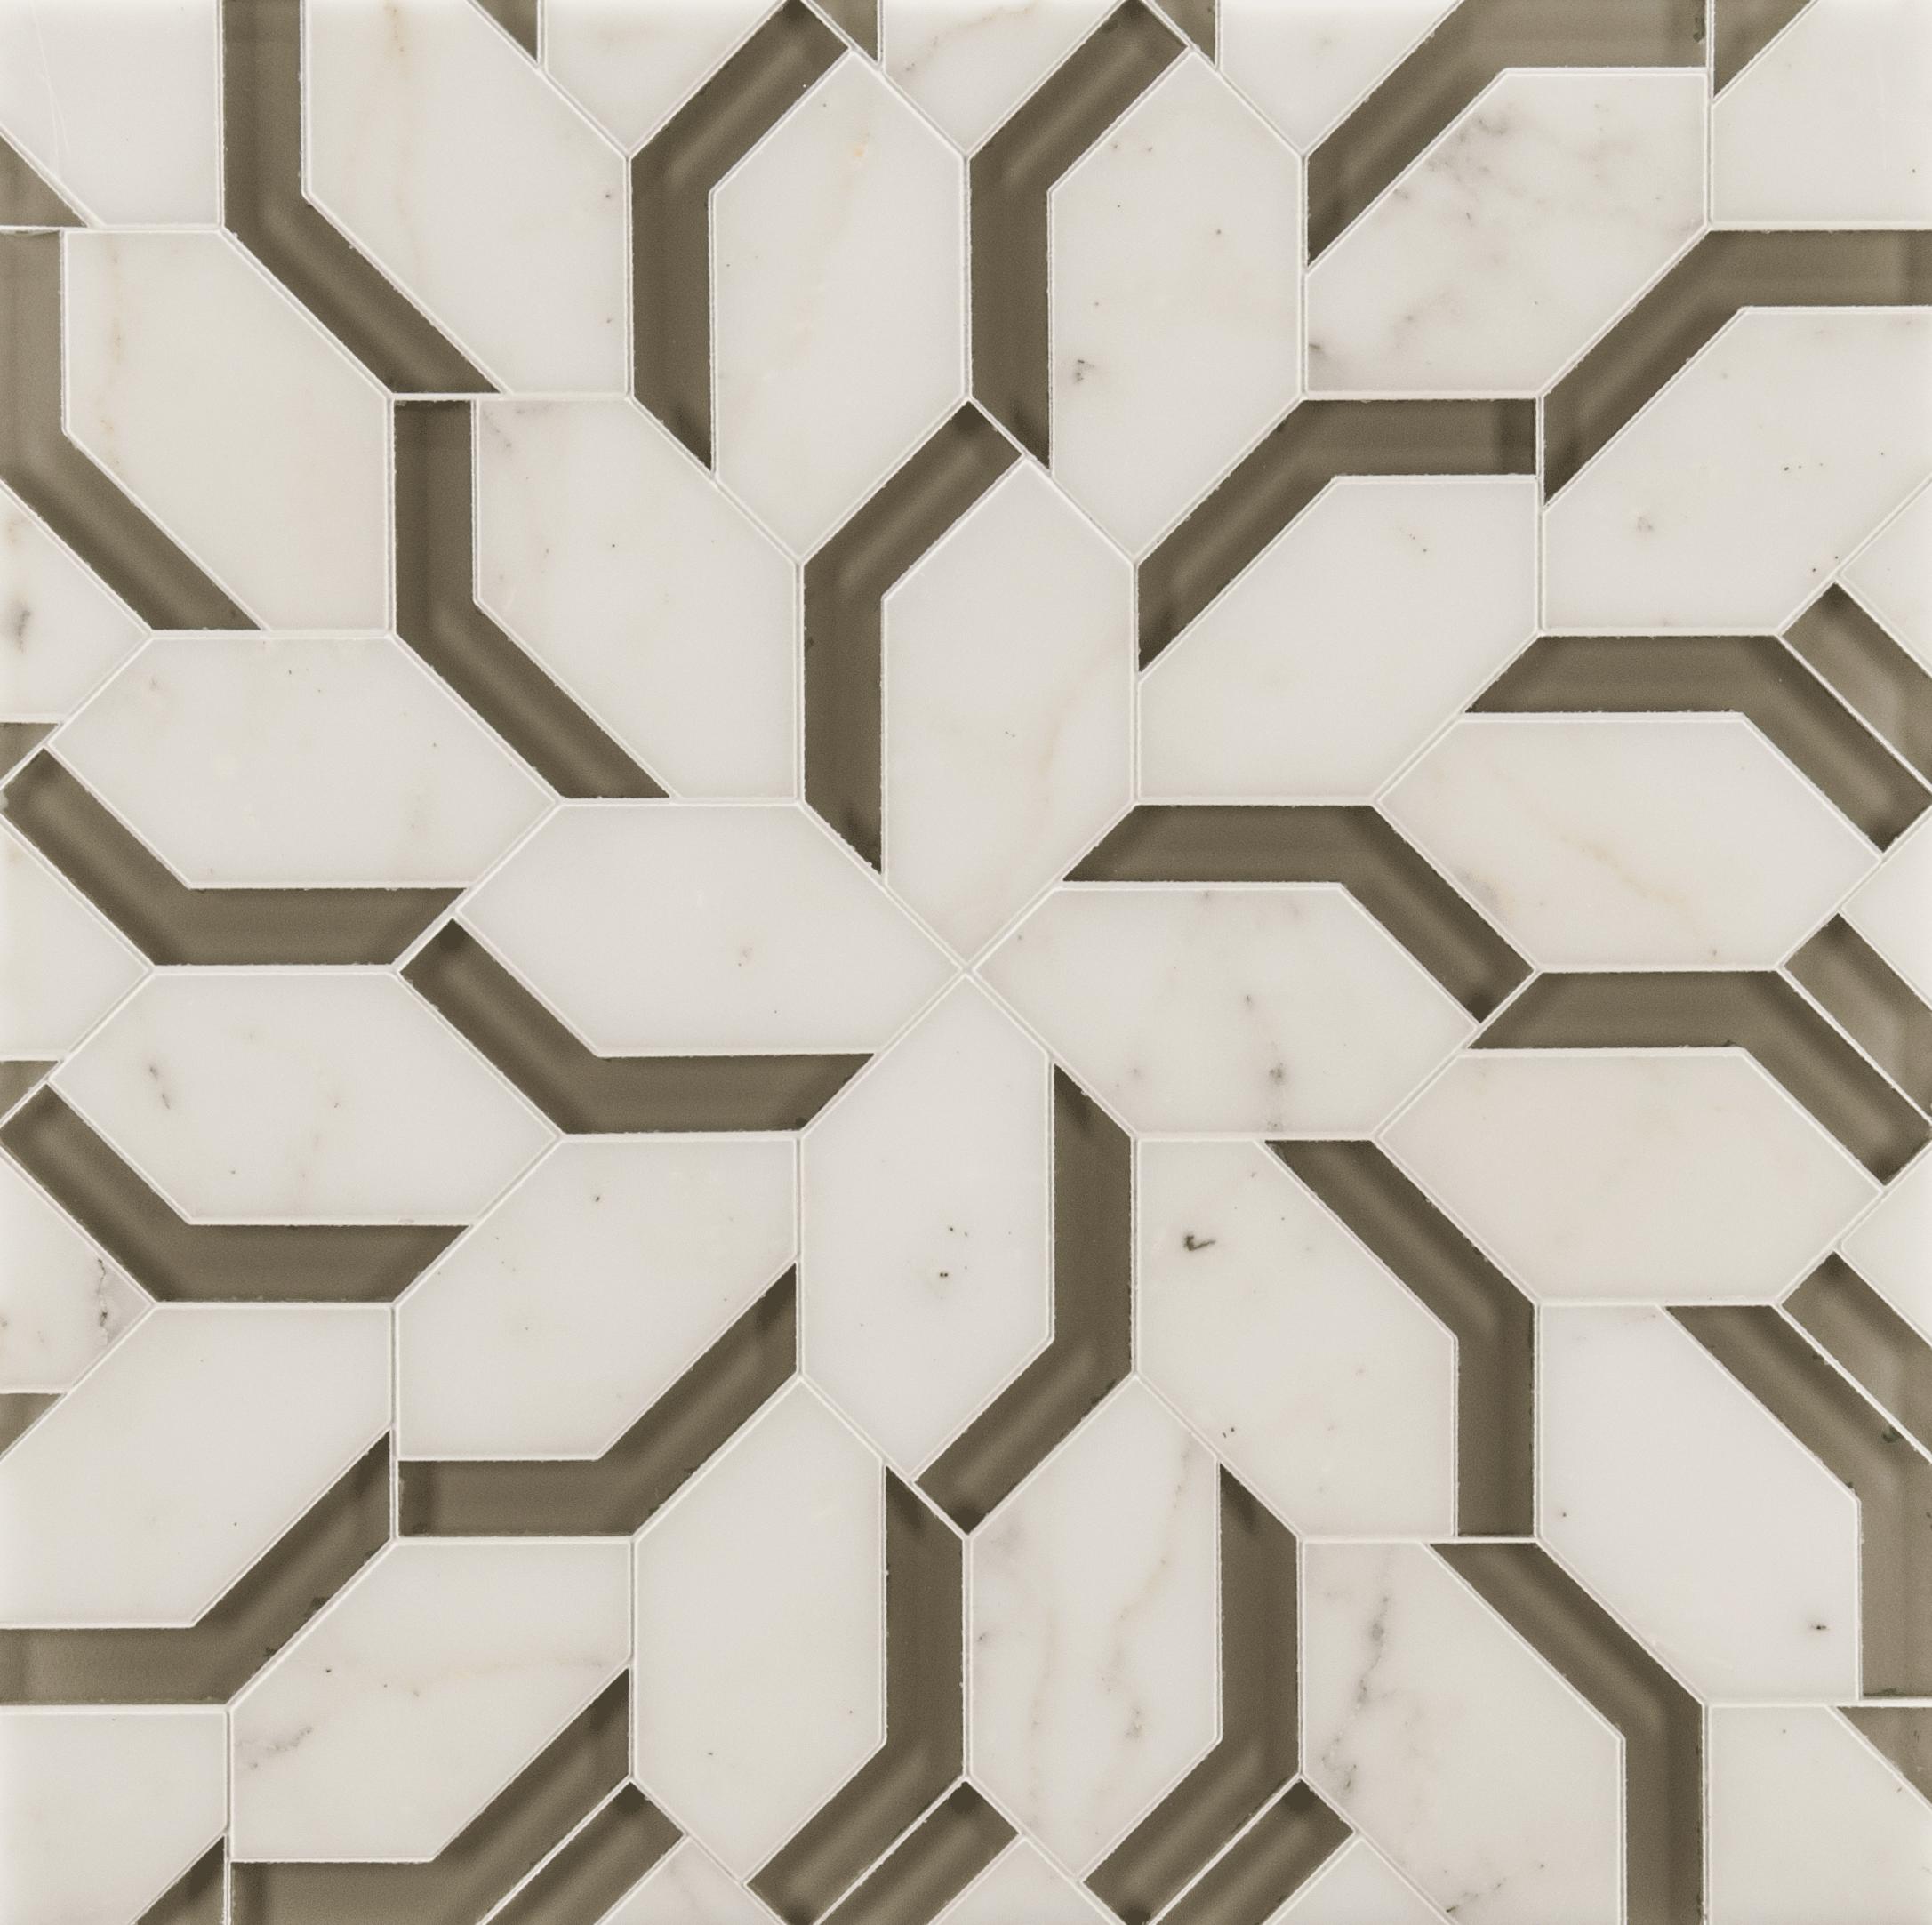 Ann Sacks Mosaic Bathroom Tile: ANN SACKS Liberty Spring Petite Mosaic In Moonstone White